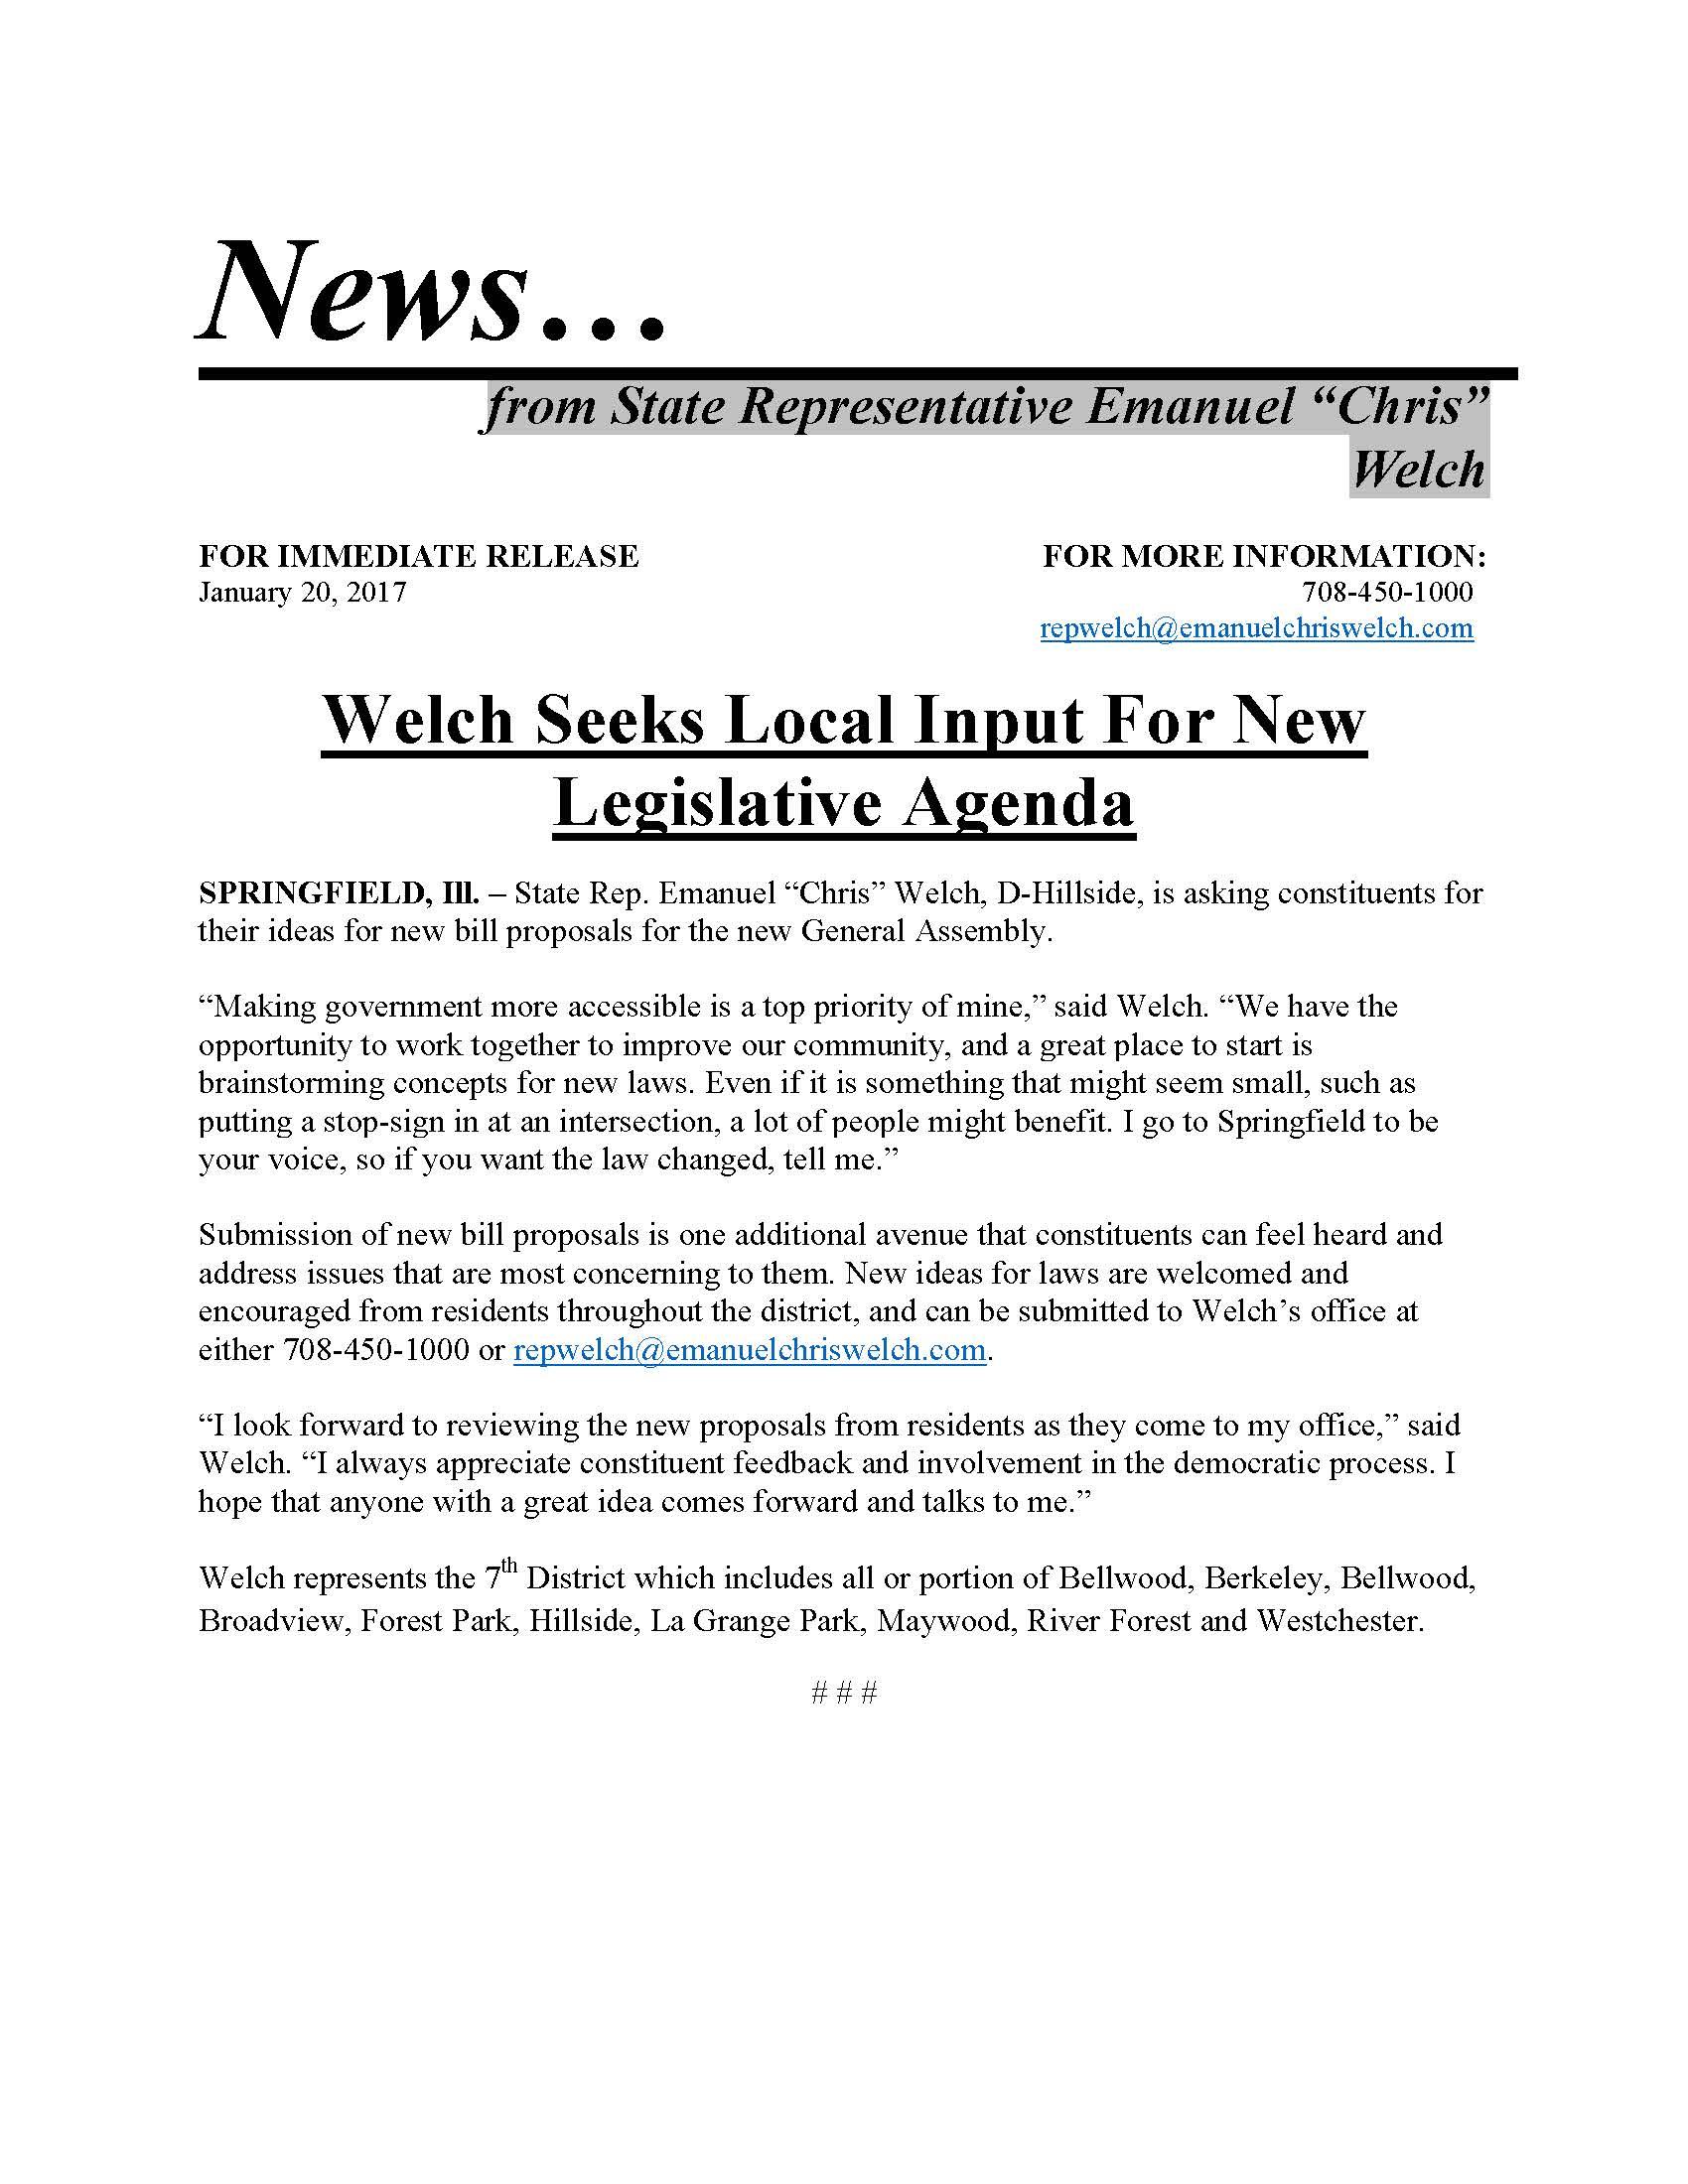 Welch Seeks Local Input for New Legislative Agenda  (January 20, 2017)